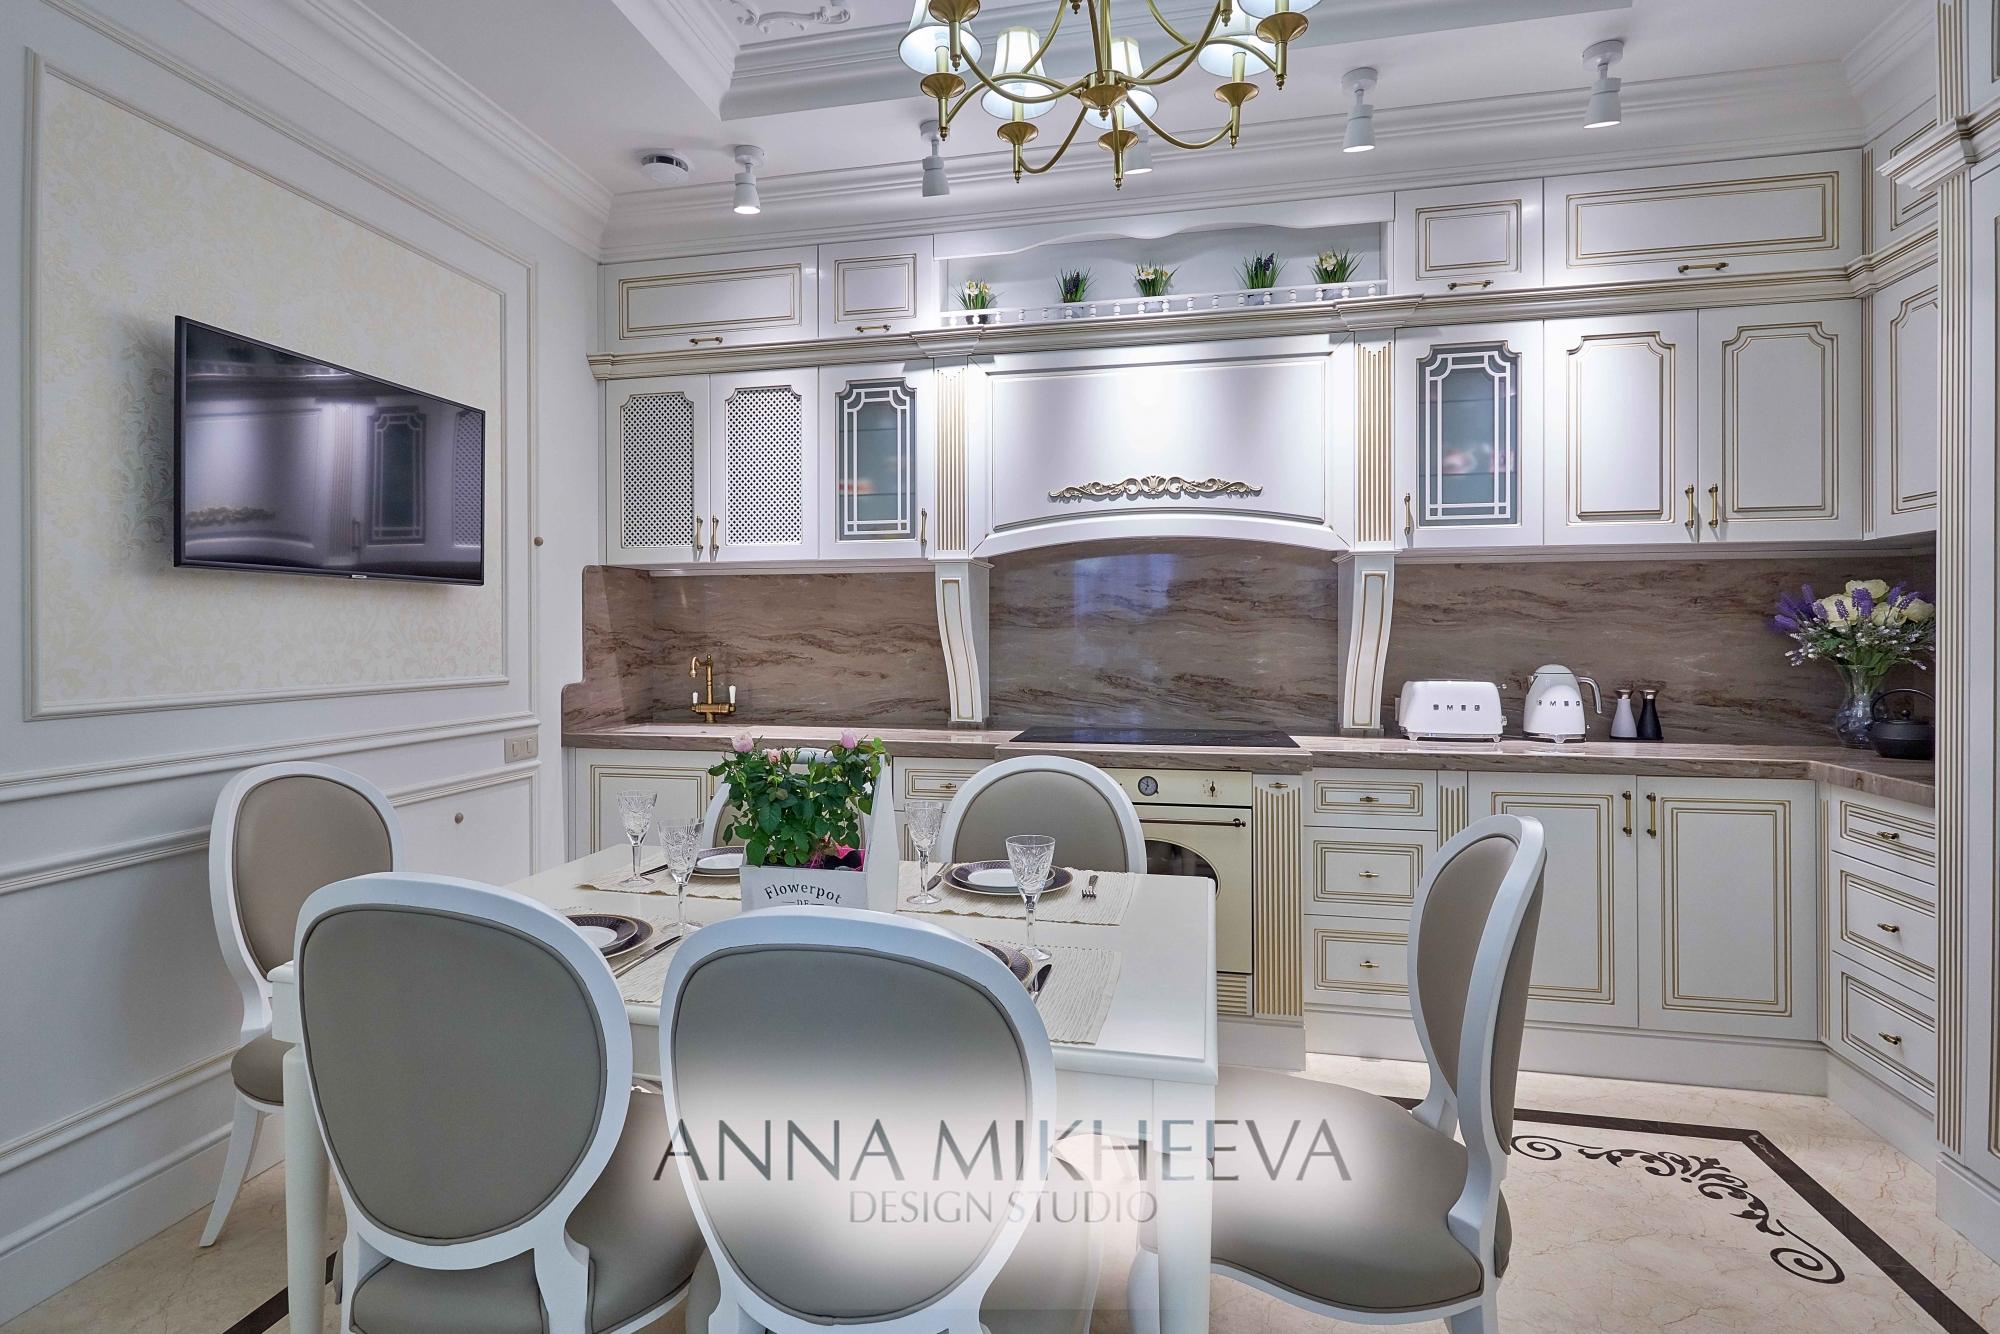 Интерьер кухни 2018 года. В Астане. Фото.